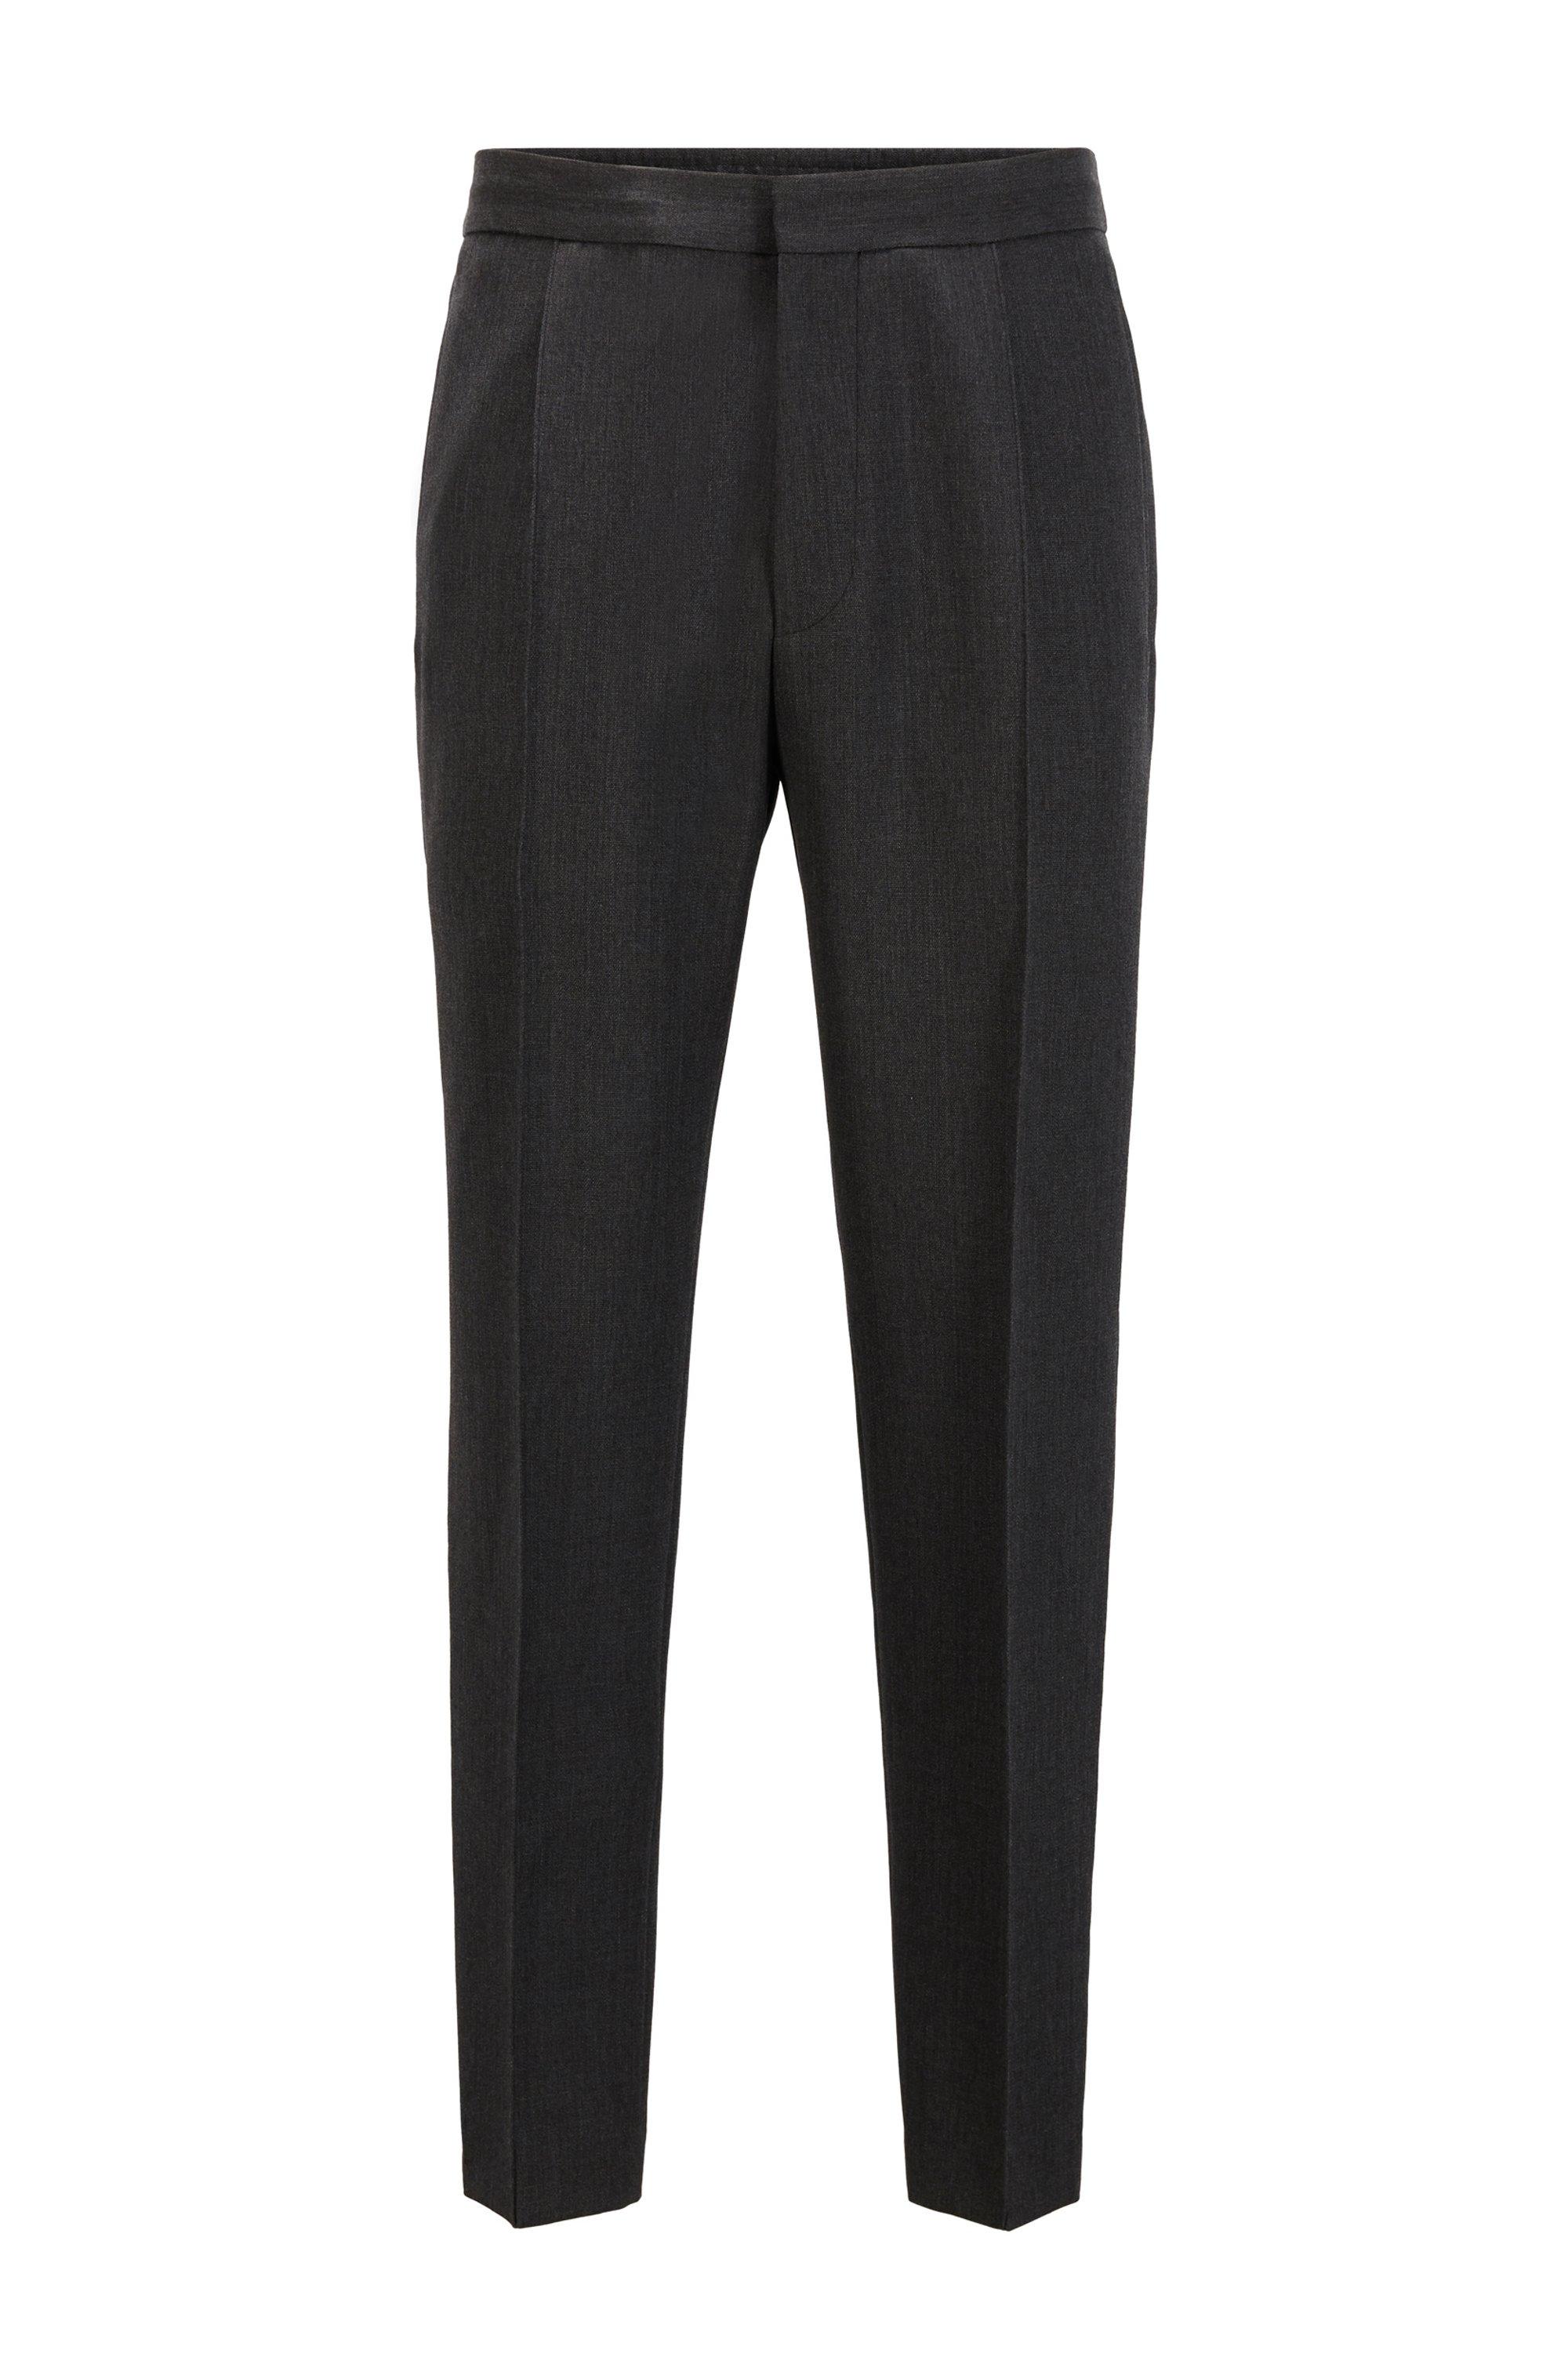 Pantaloni straight fit in lana vergine con piega cucita, Grigio scuro